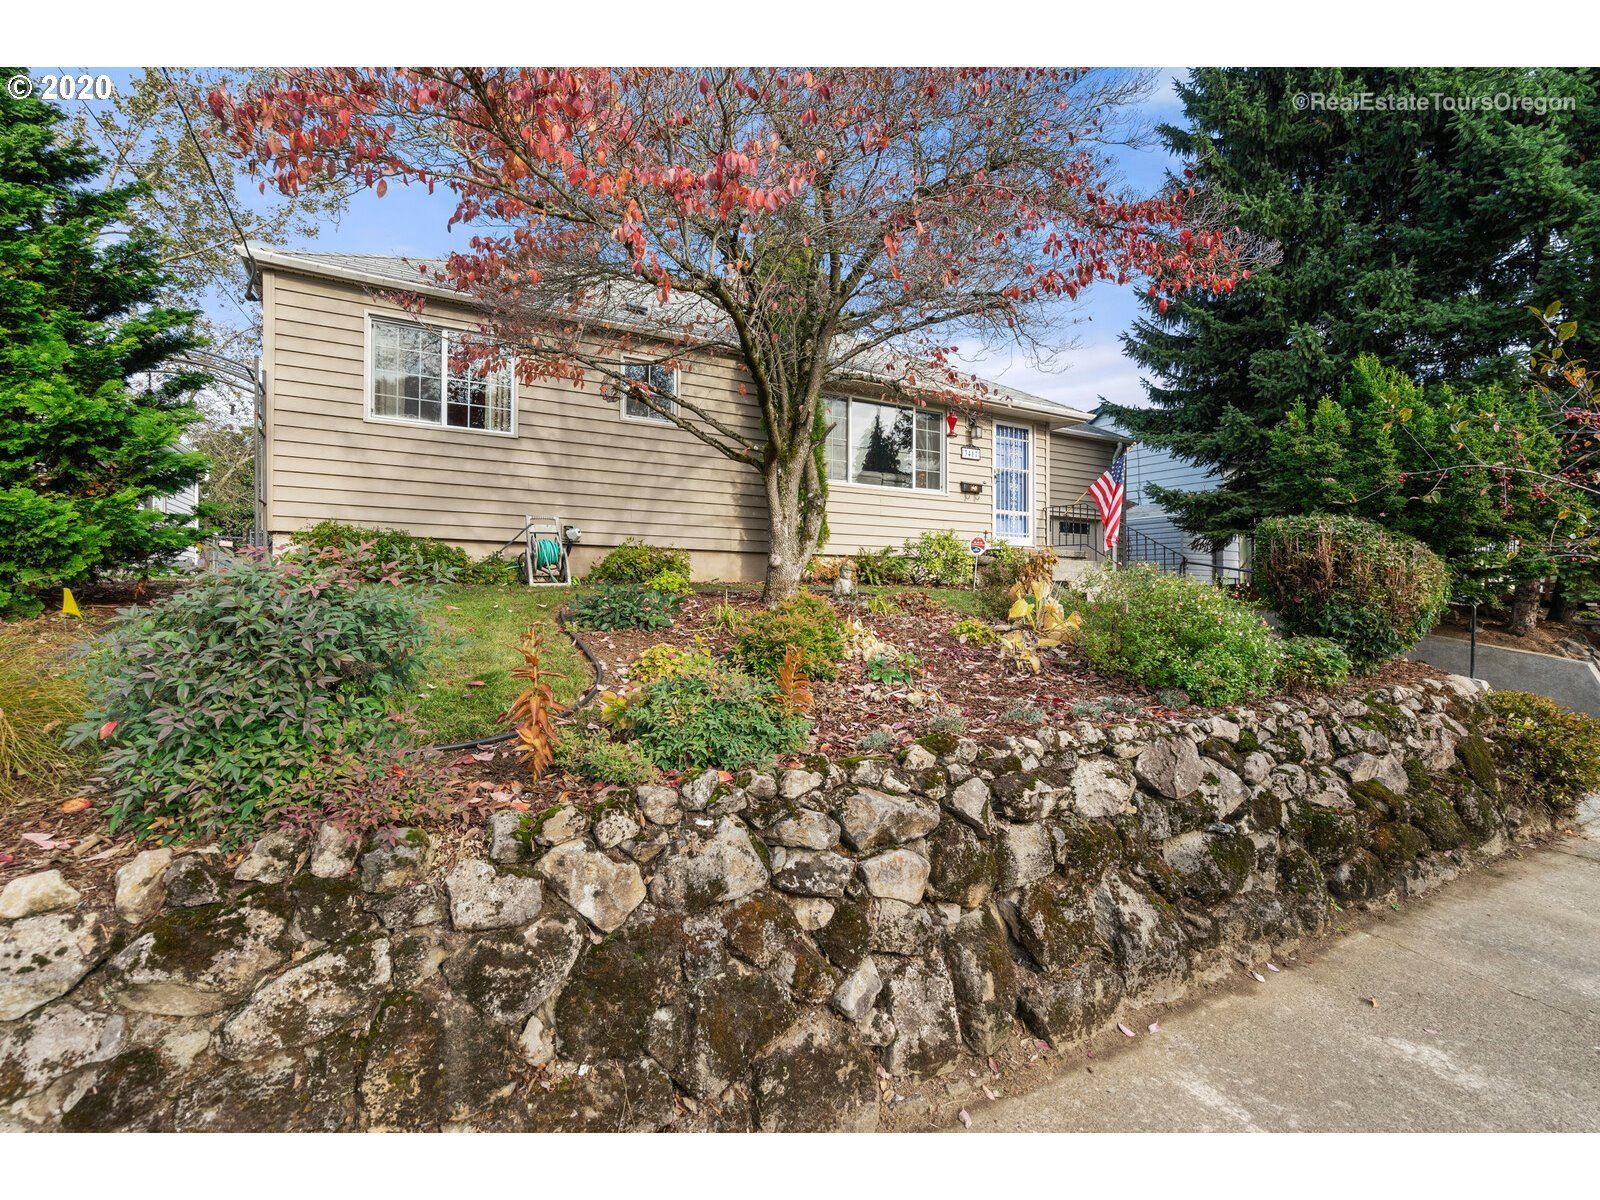 3417 NE ROSA PARKS WAY, Portland, OR 97211 - MLS#: 20501174